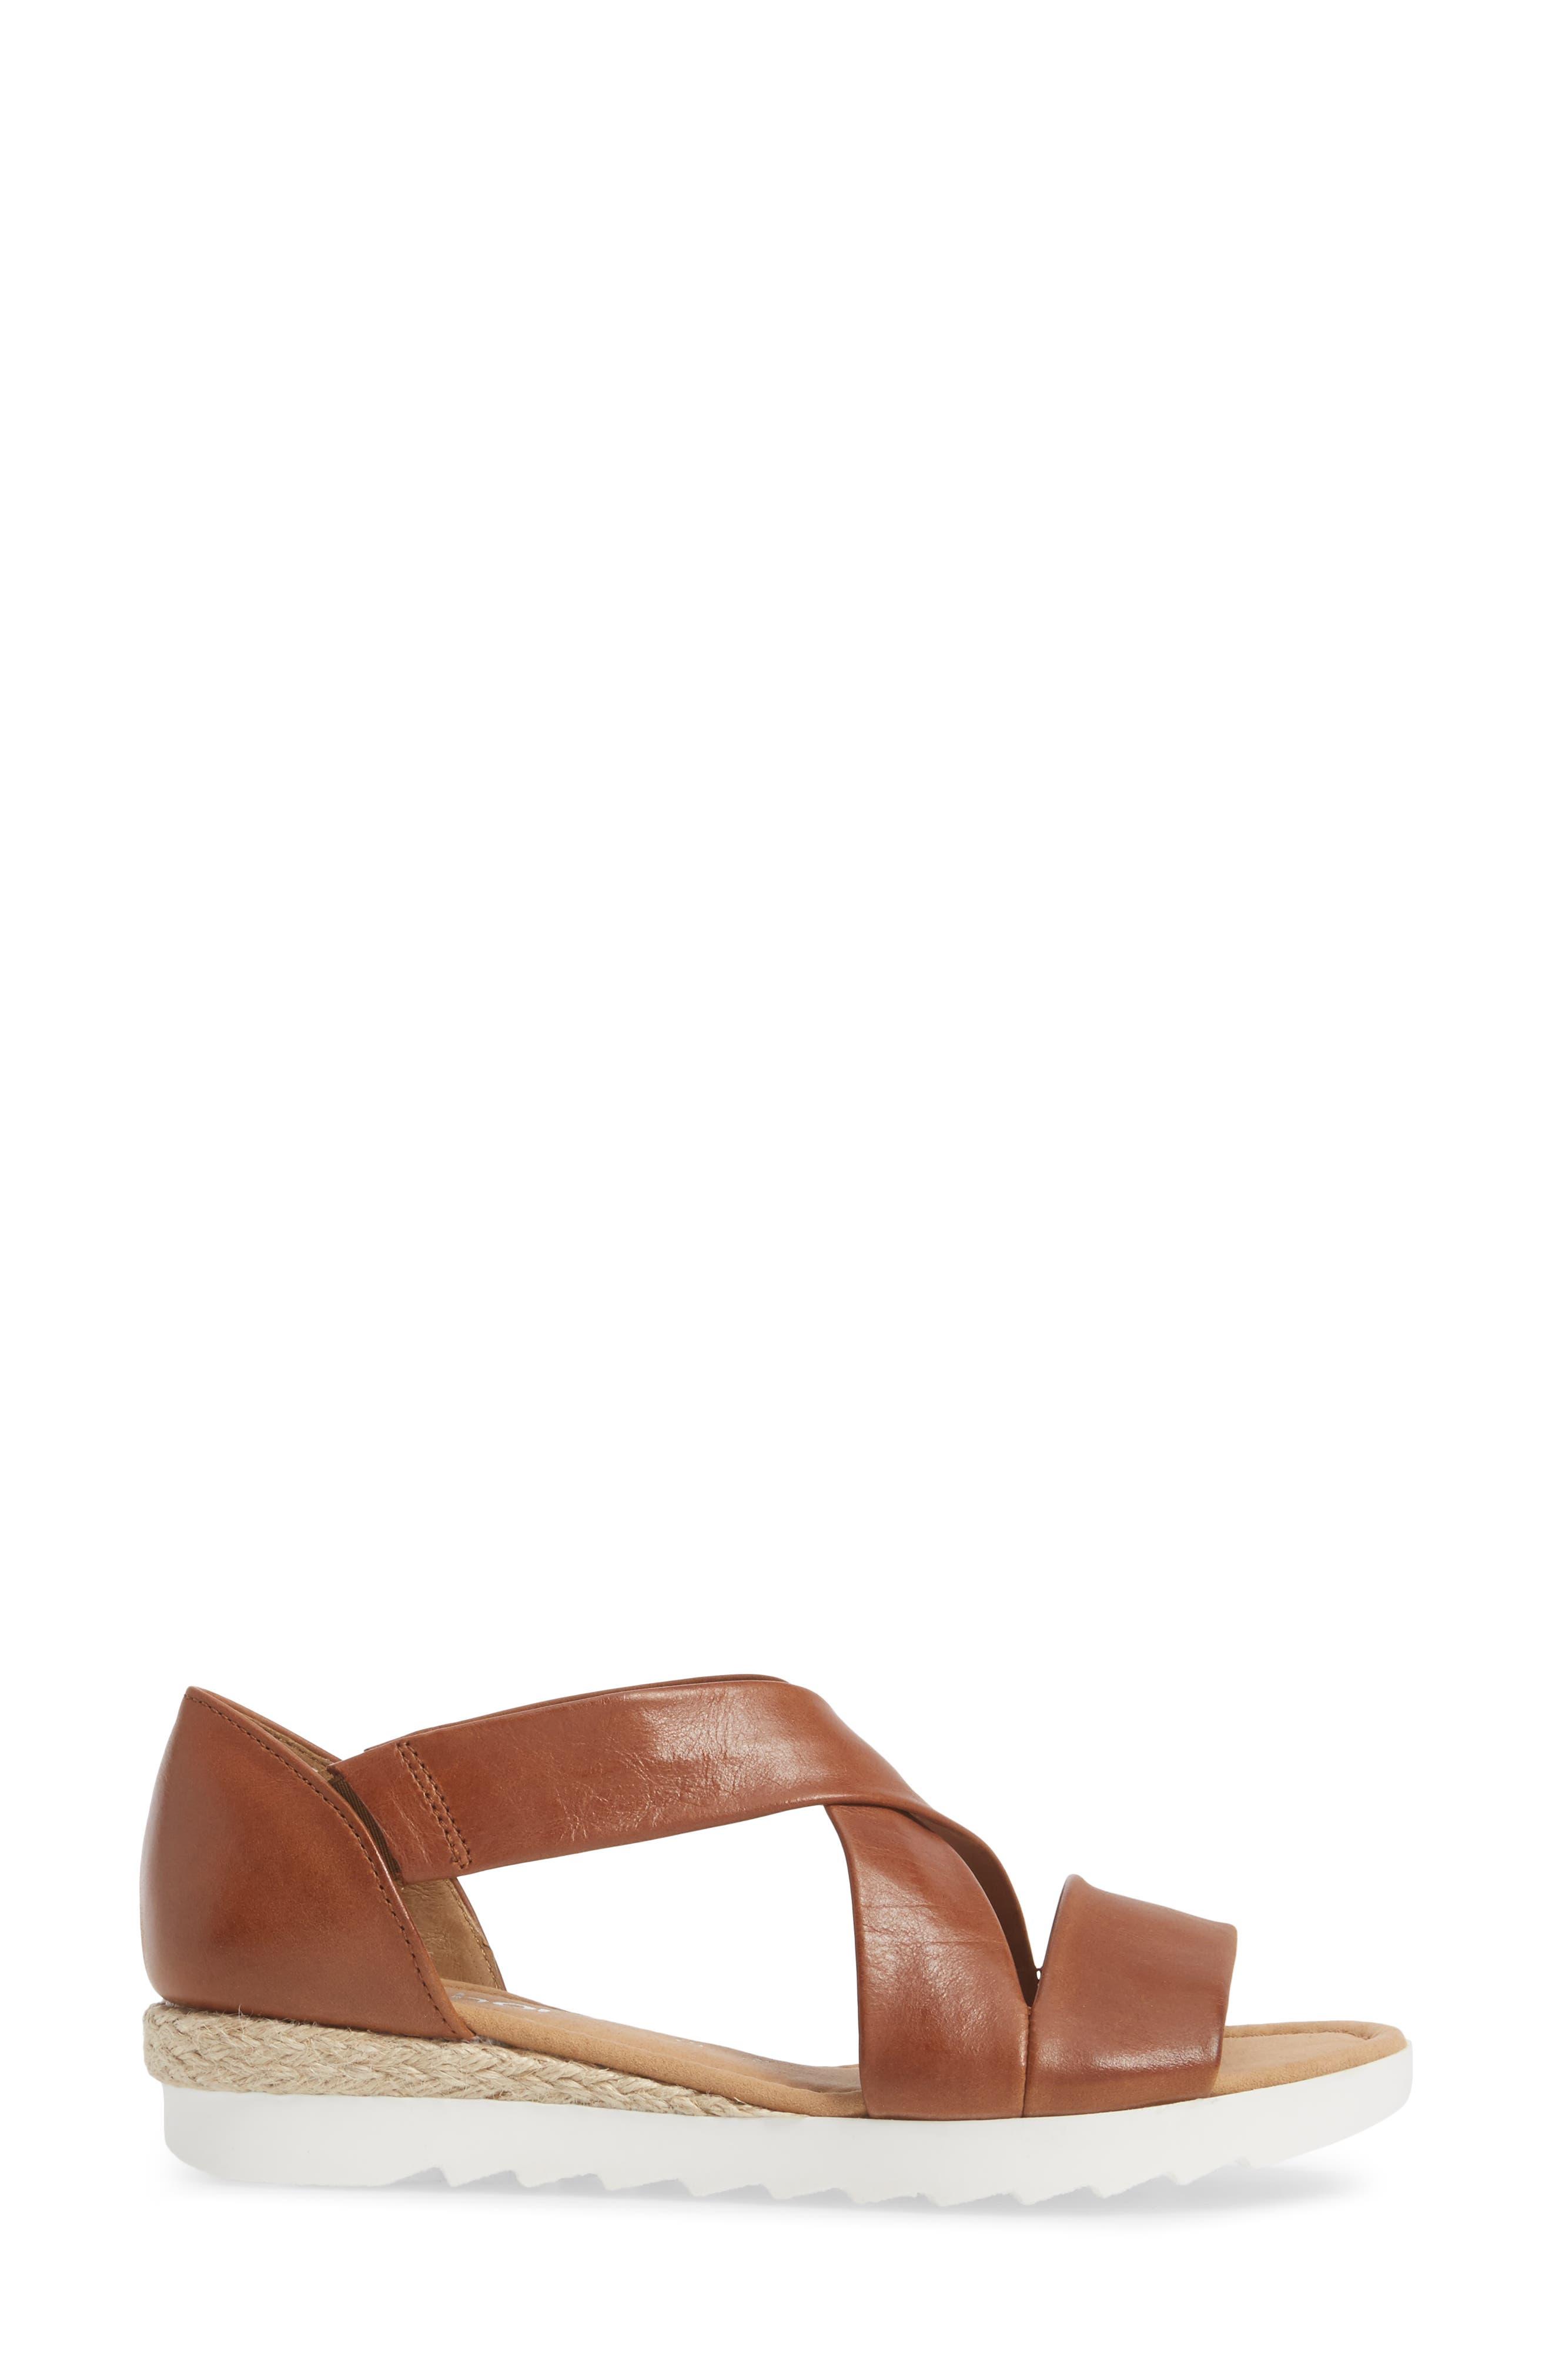 Cross Strap Sandal,                             Alternate thumbnail 3, color,                             Brown Leather